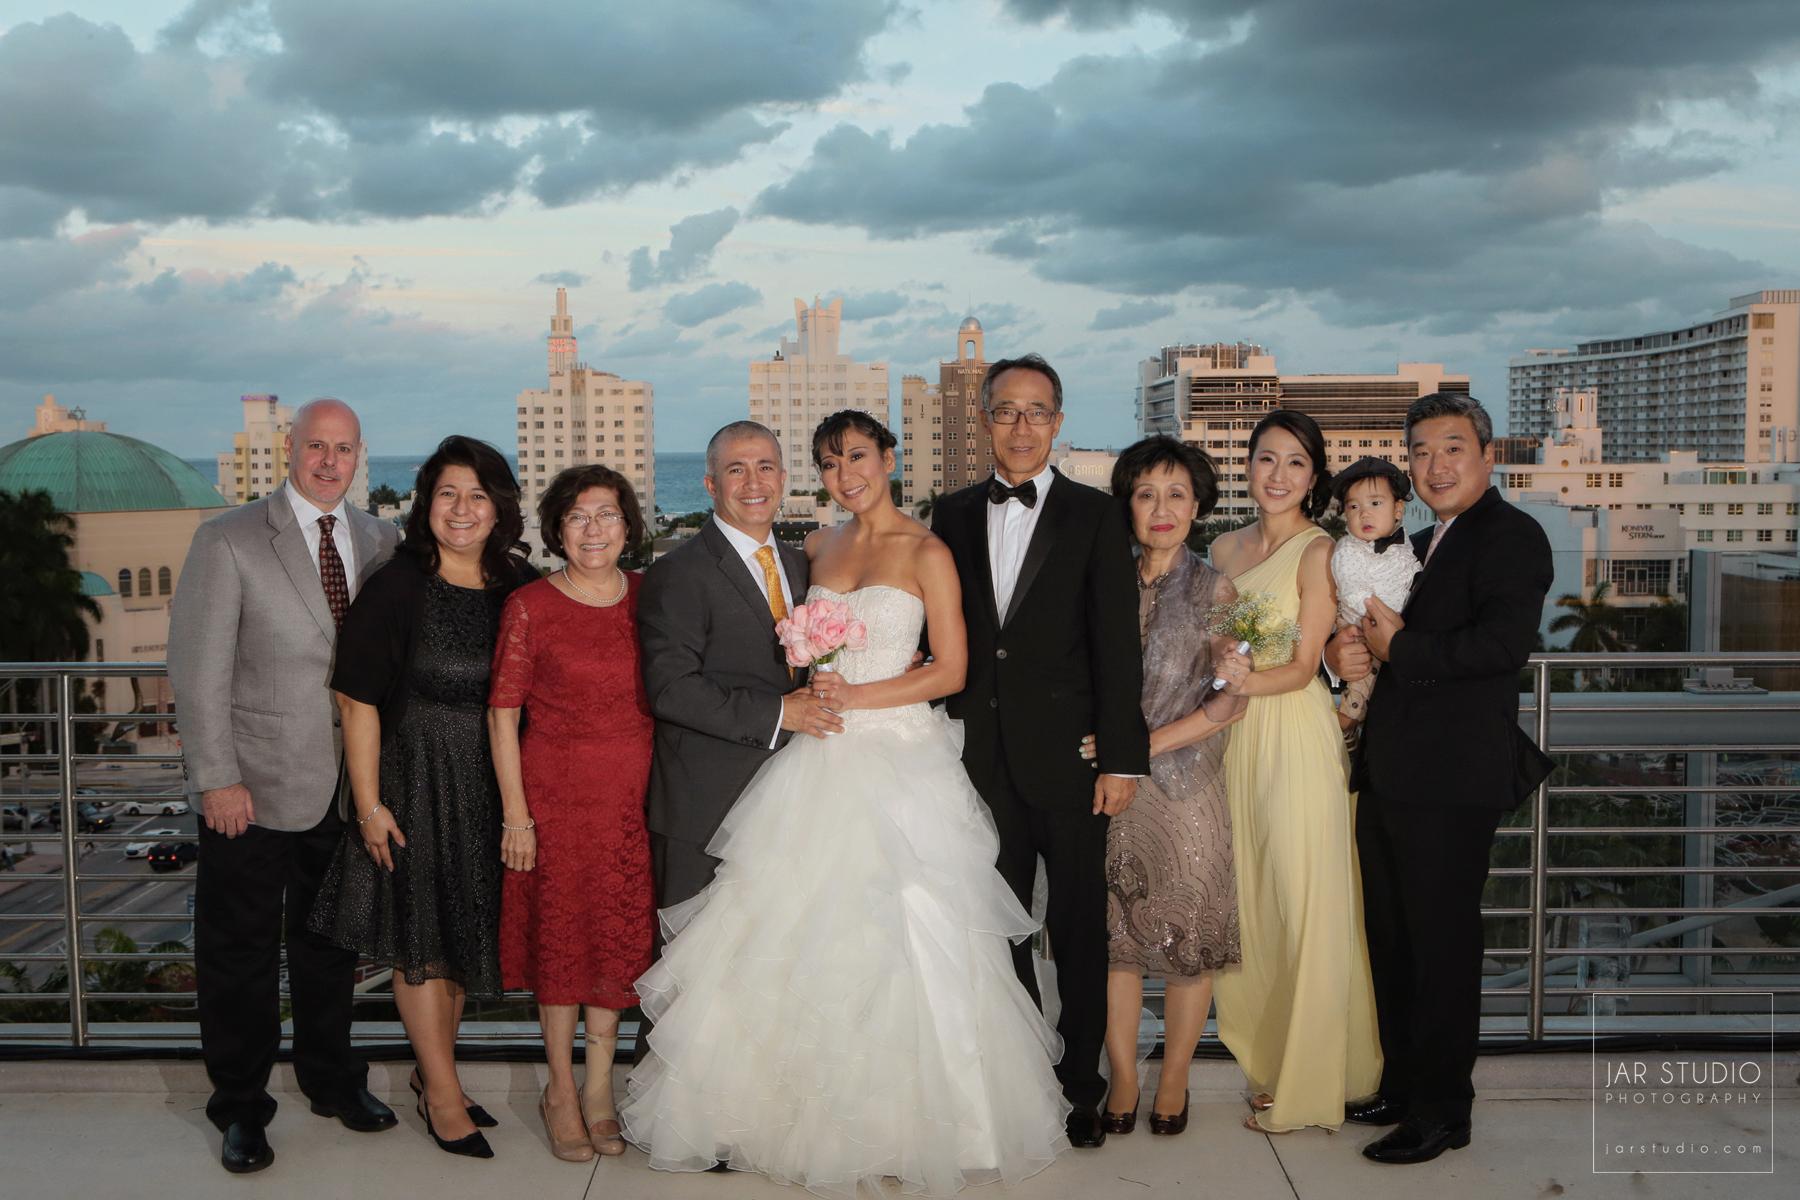 28-jarstudio-asian-family-wedding-portrait-photographer.jpg